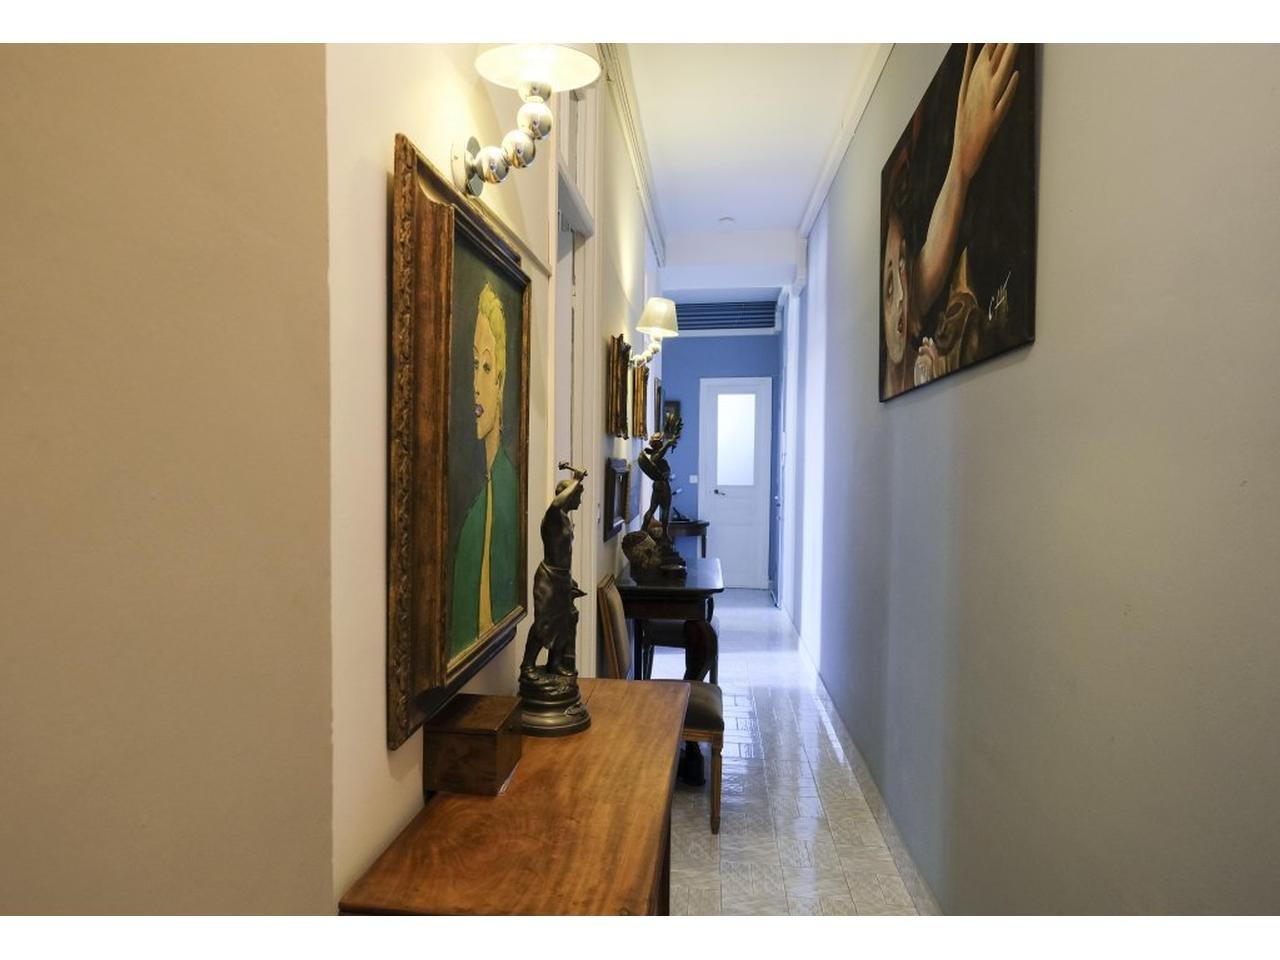 Appartement  3 Locali 94m2  In vendita   545000 €